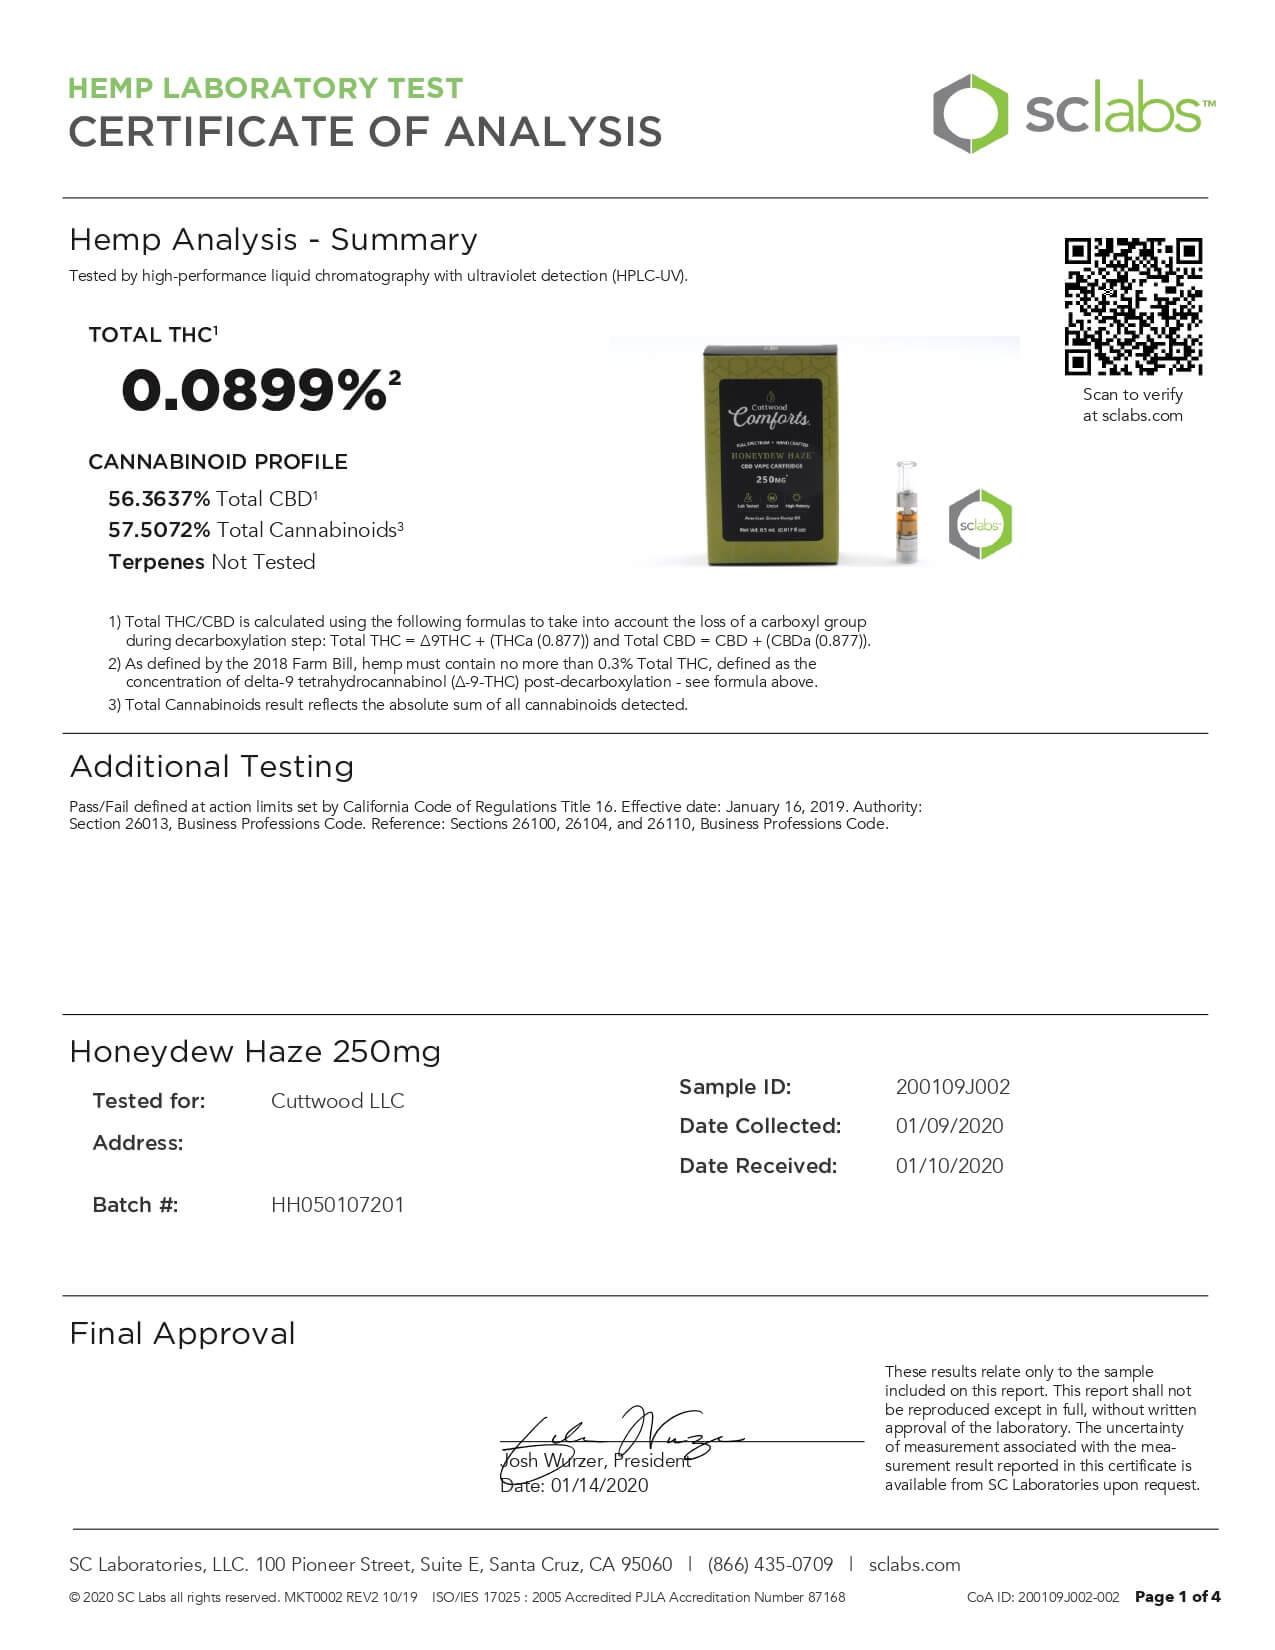 Cuttwood Comforts CBD Vape Cartridge Full Spectrum Honeydew Haze 250mg Lab Report